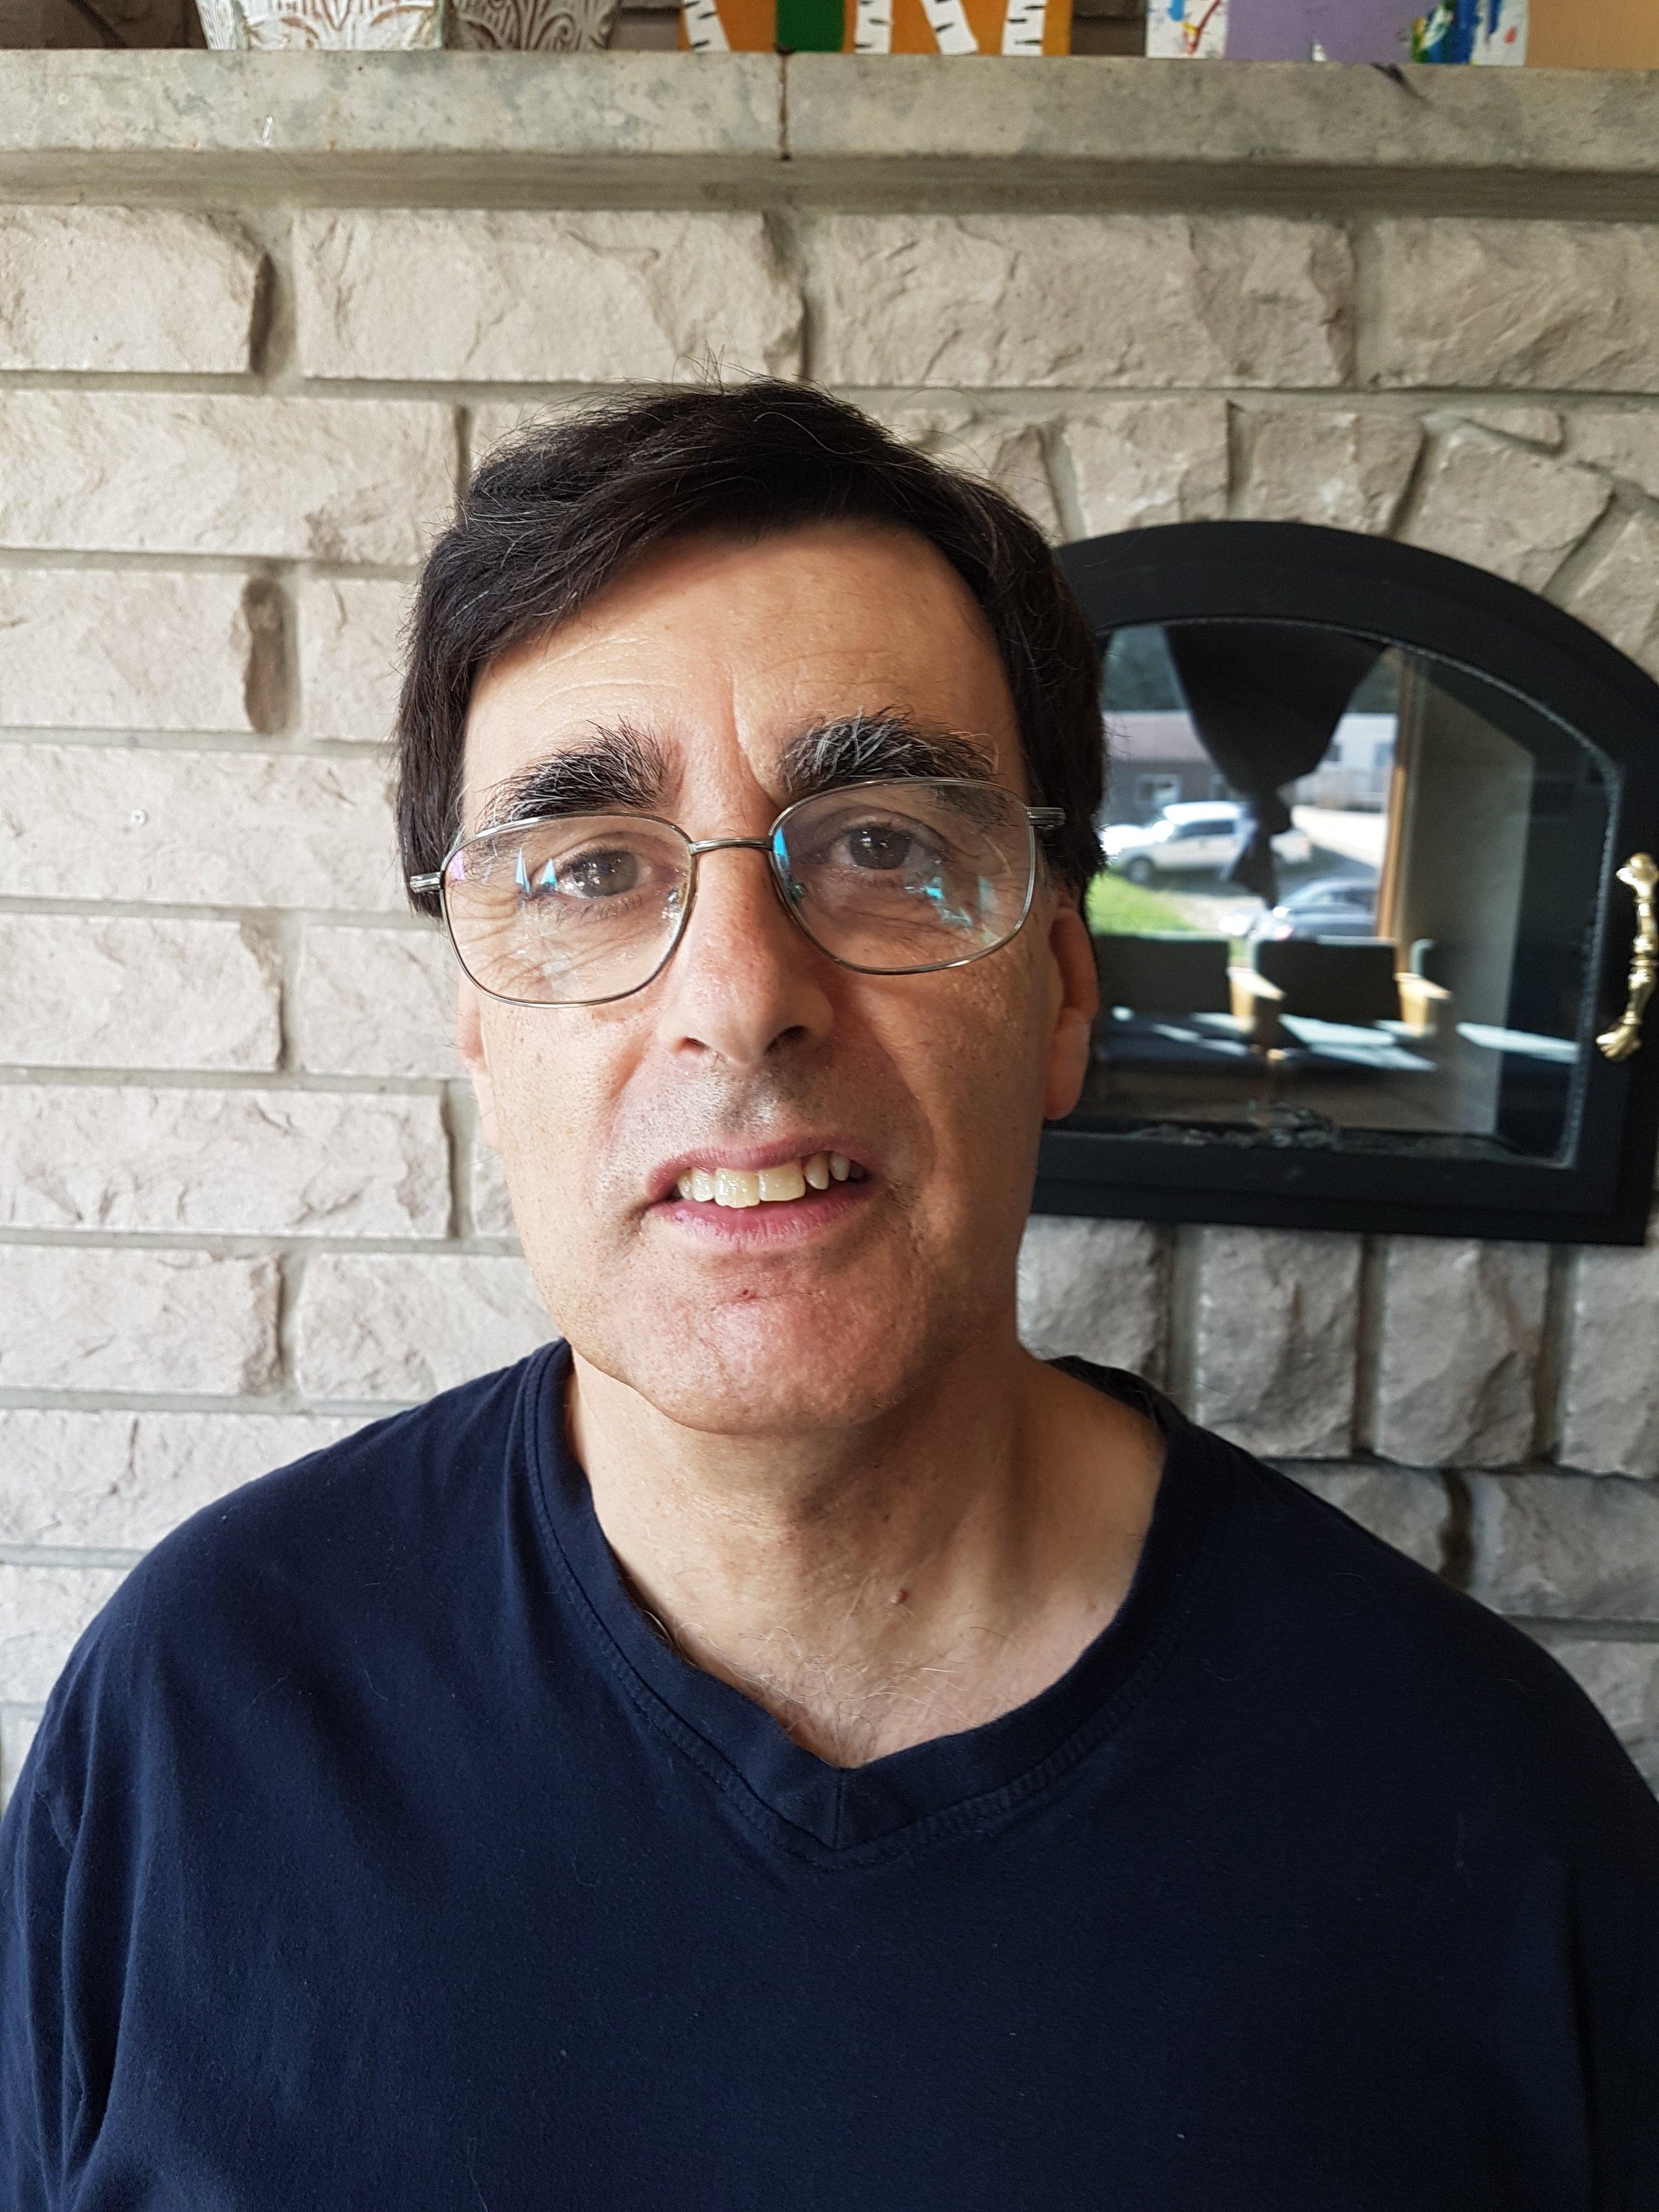 PAUL CARDELLA, CUSTODIAN/MAINTENANCE